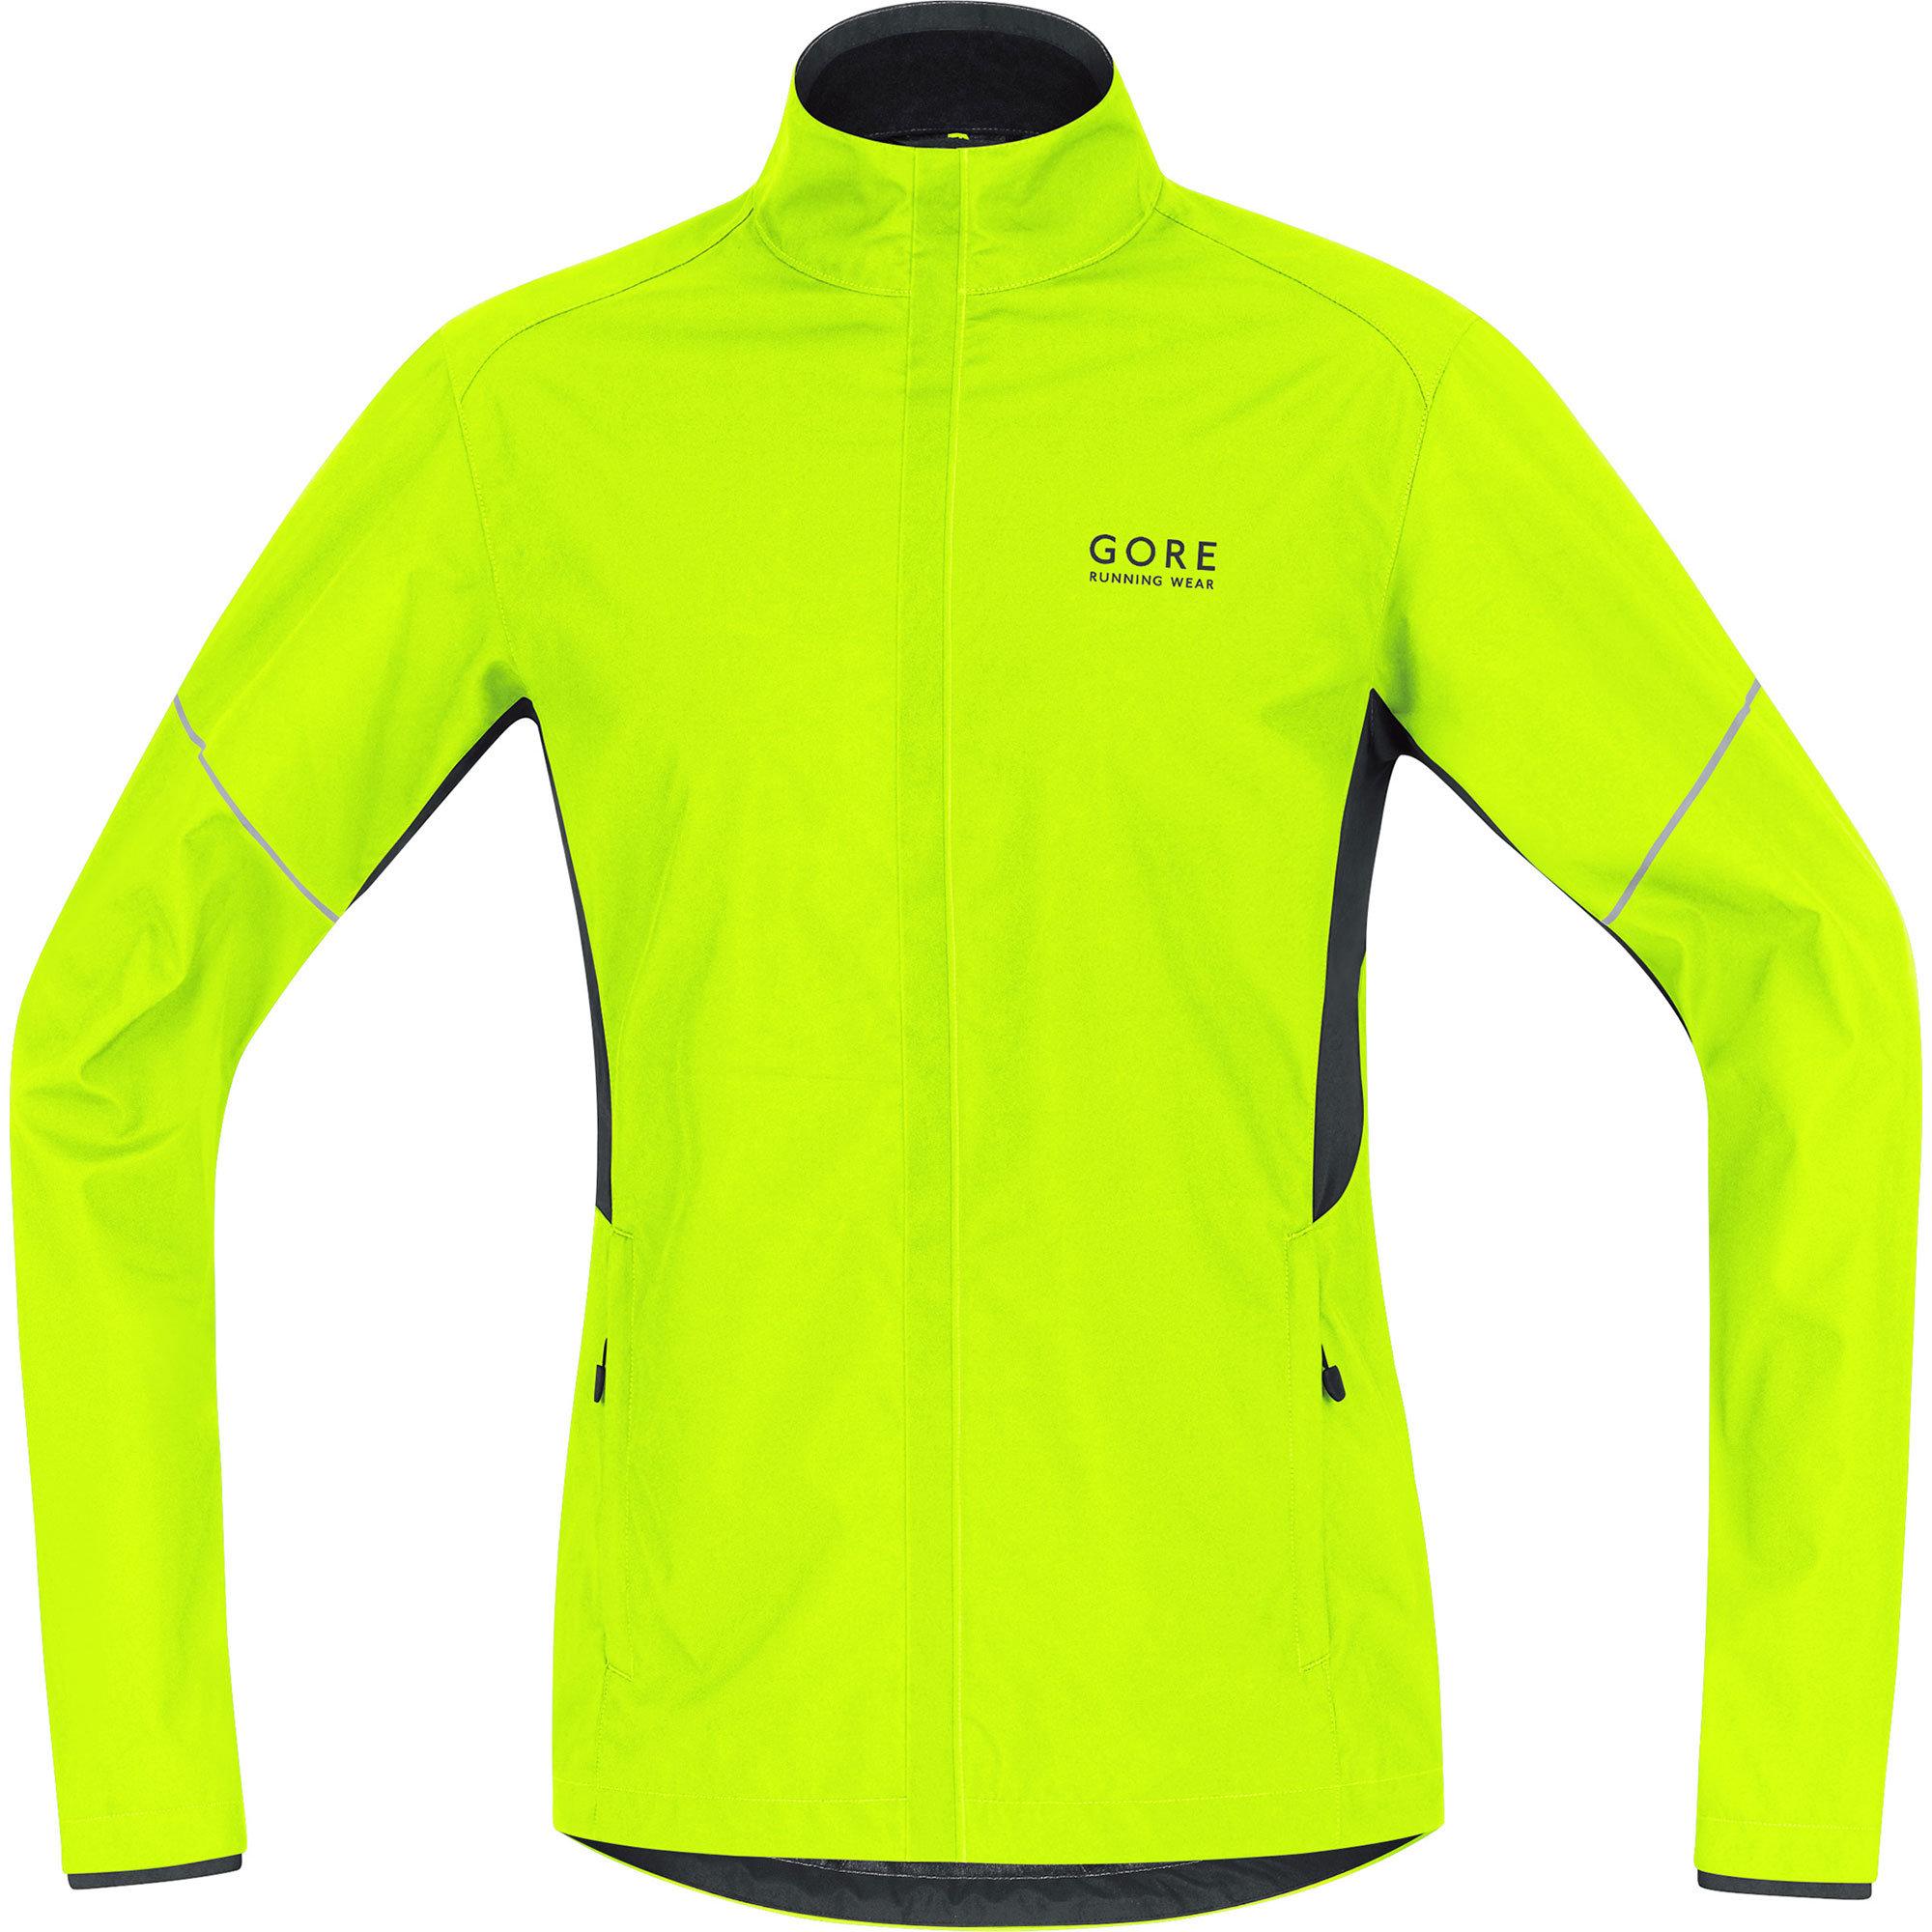 Gore Essential AS Partial Jacket in Neon Gelb